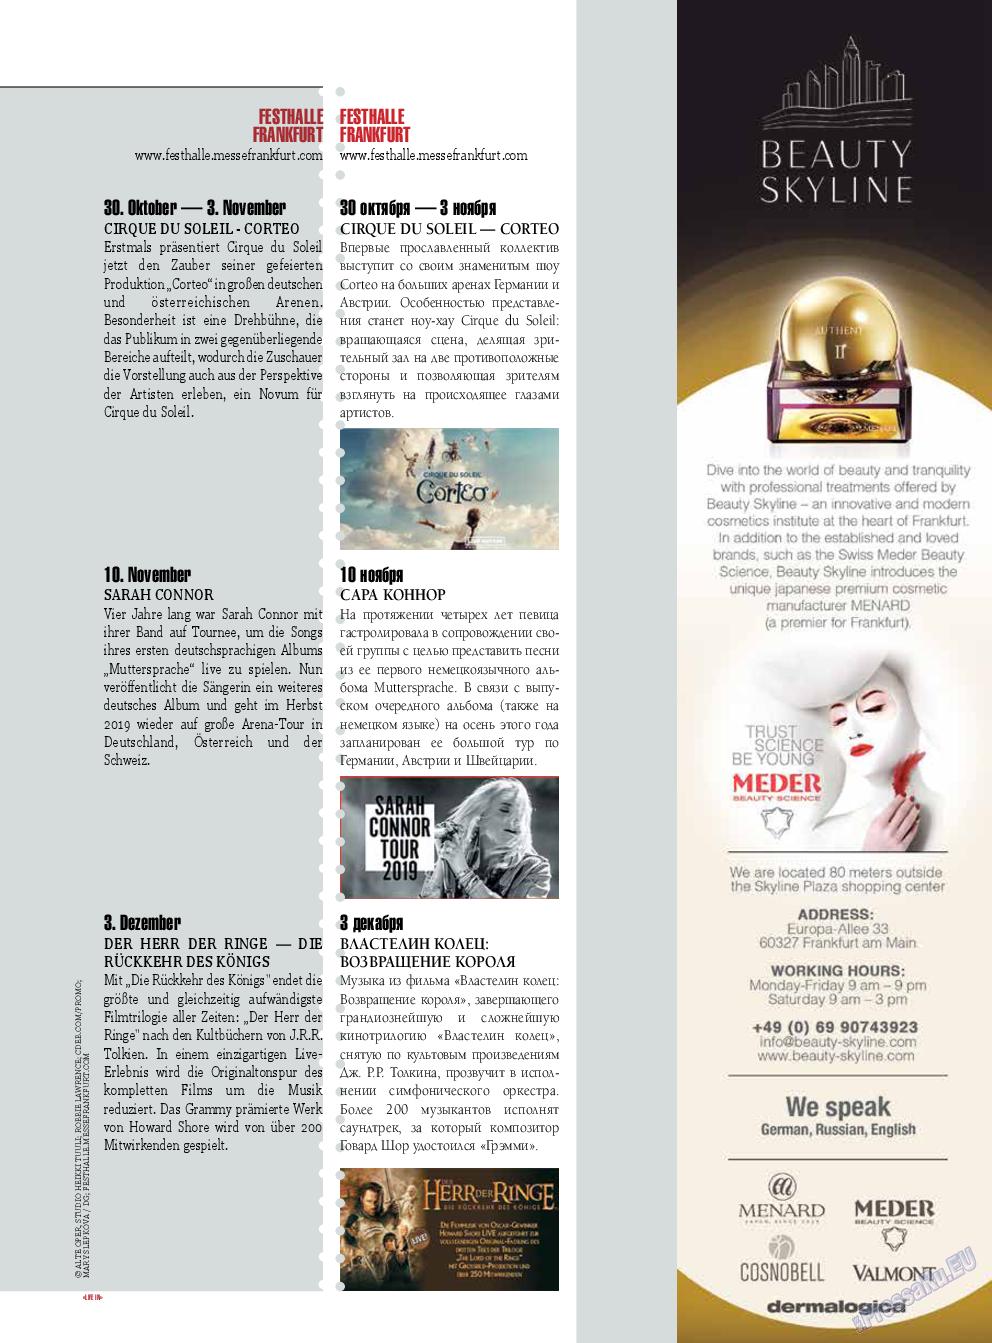 Life in Франкфурт (журнал). 2019 год, номер 44, стр. 7